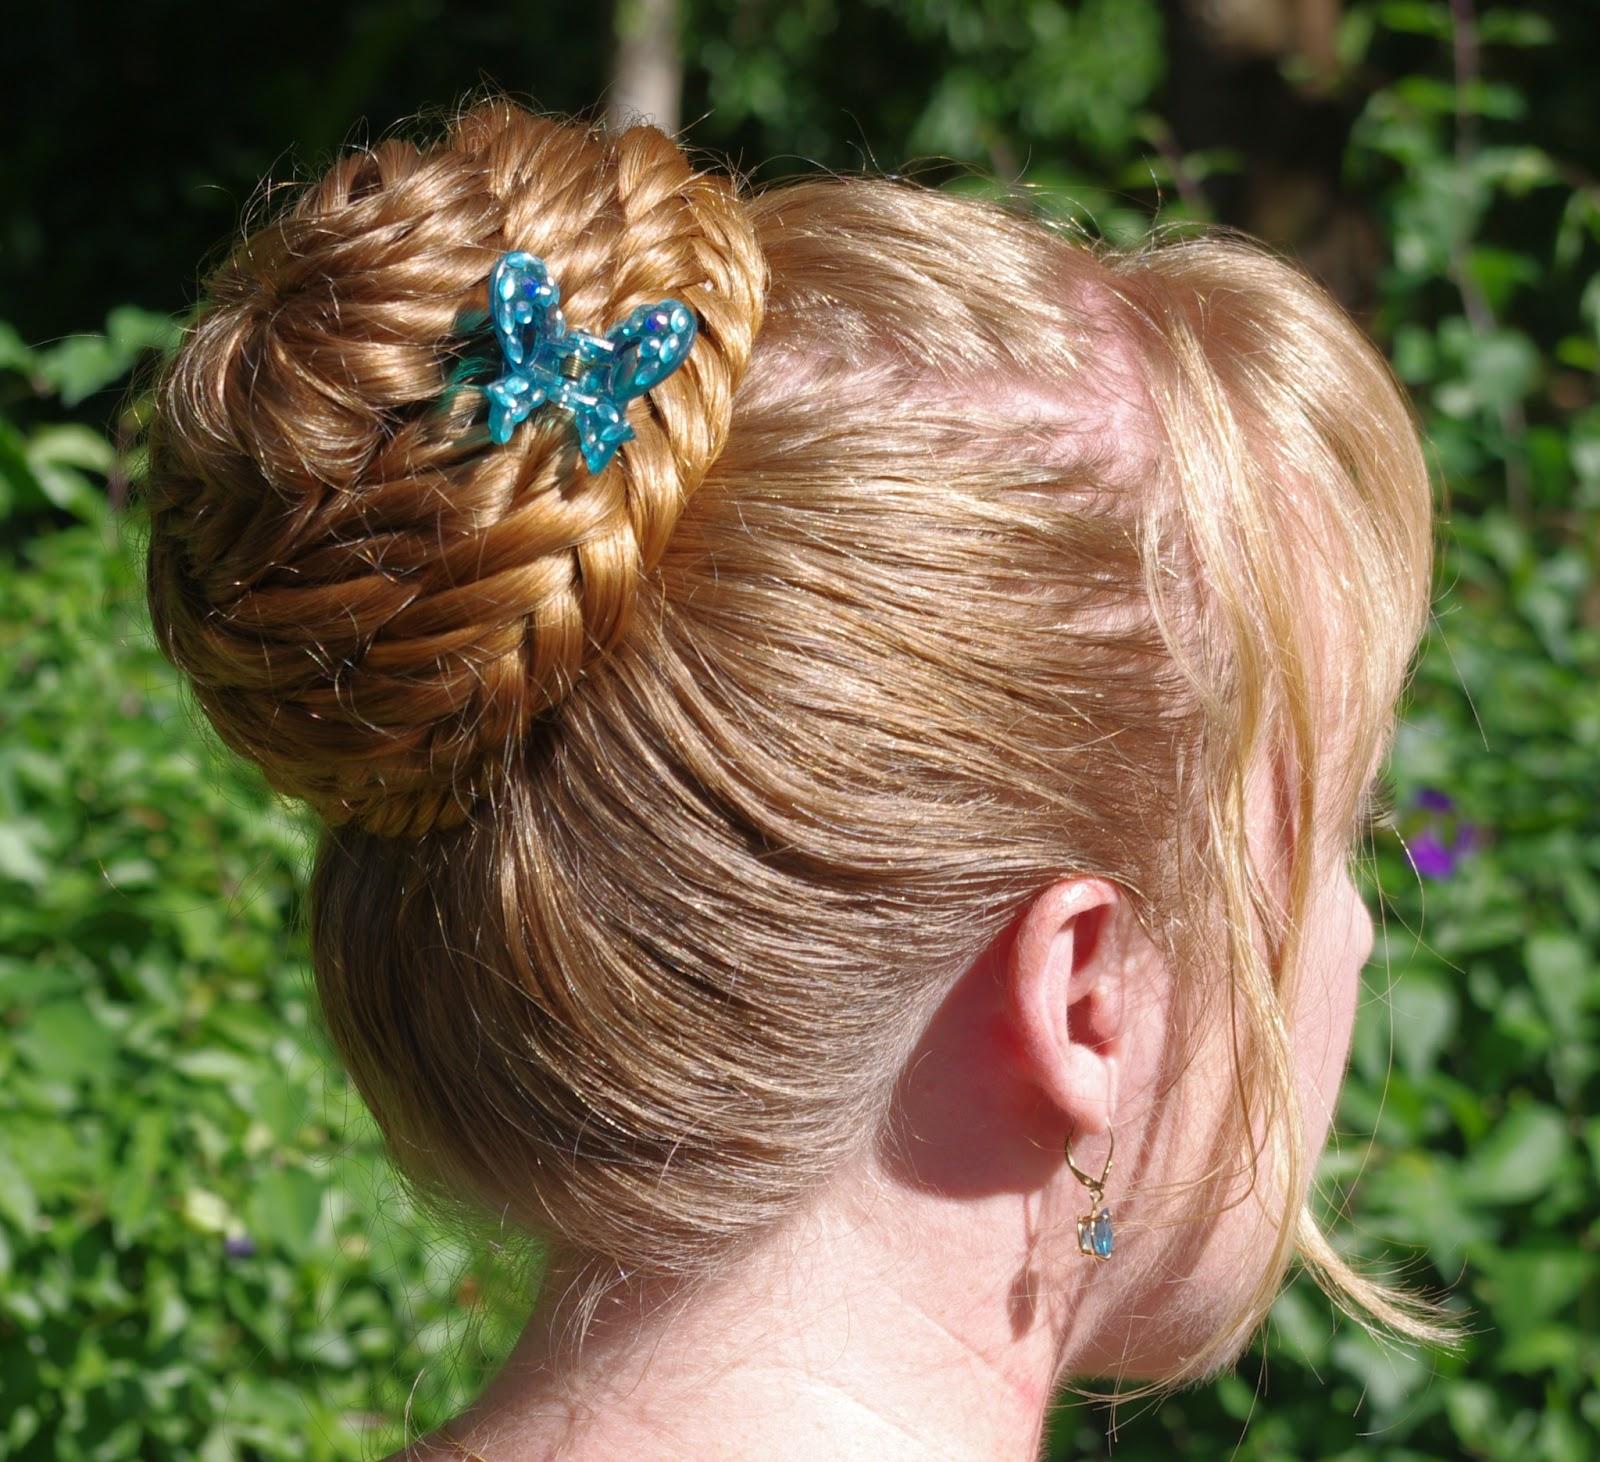 Fishtail Braid Hairstyles: Braids & Hairstyles For Super Long Hair: Herringbone